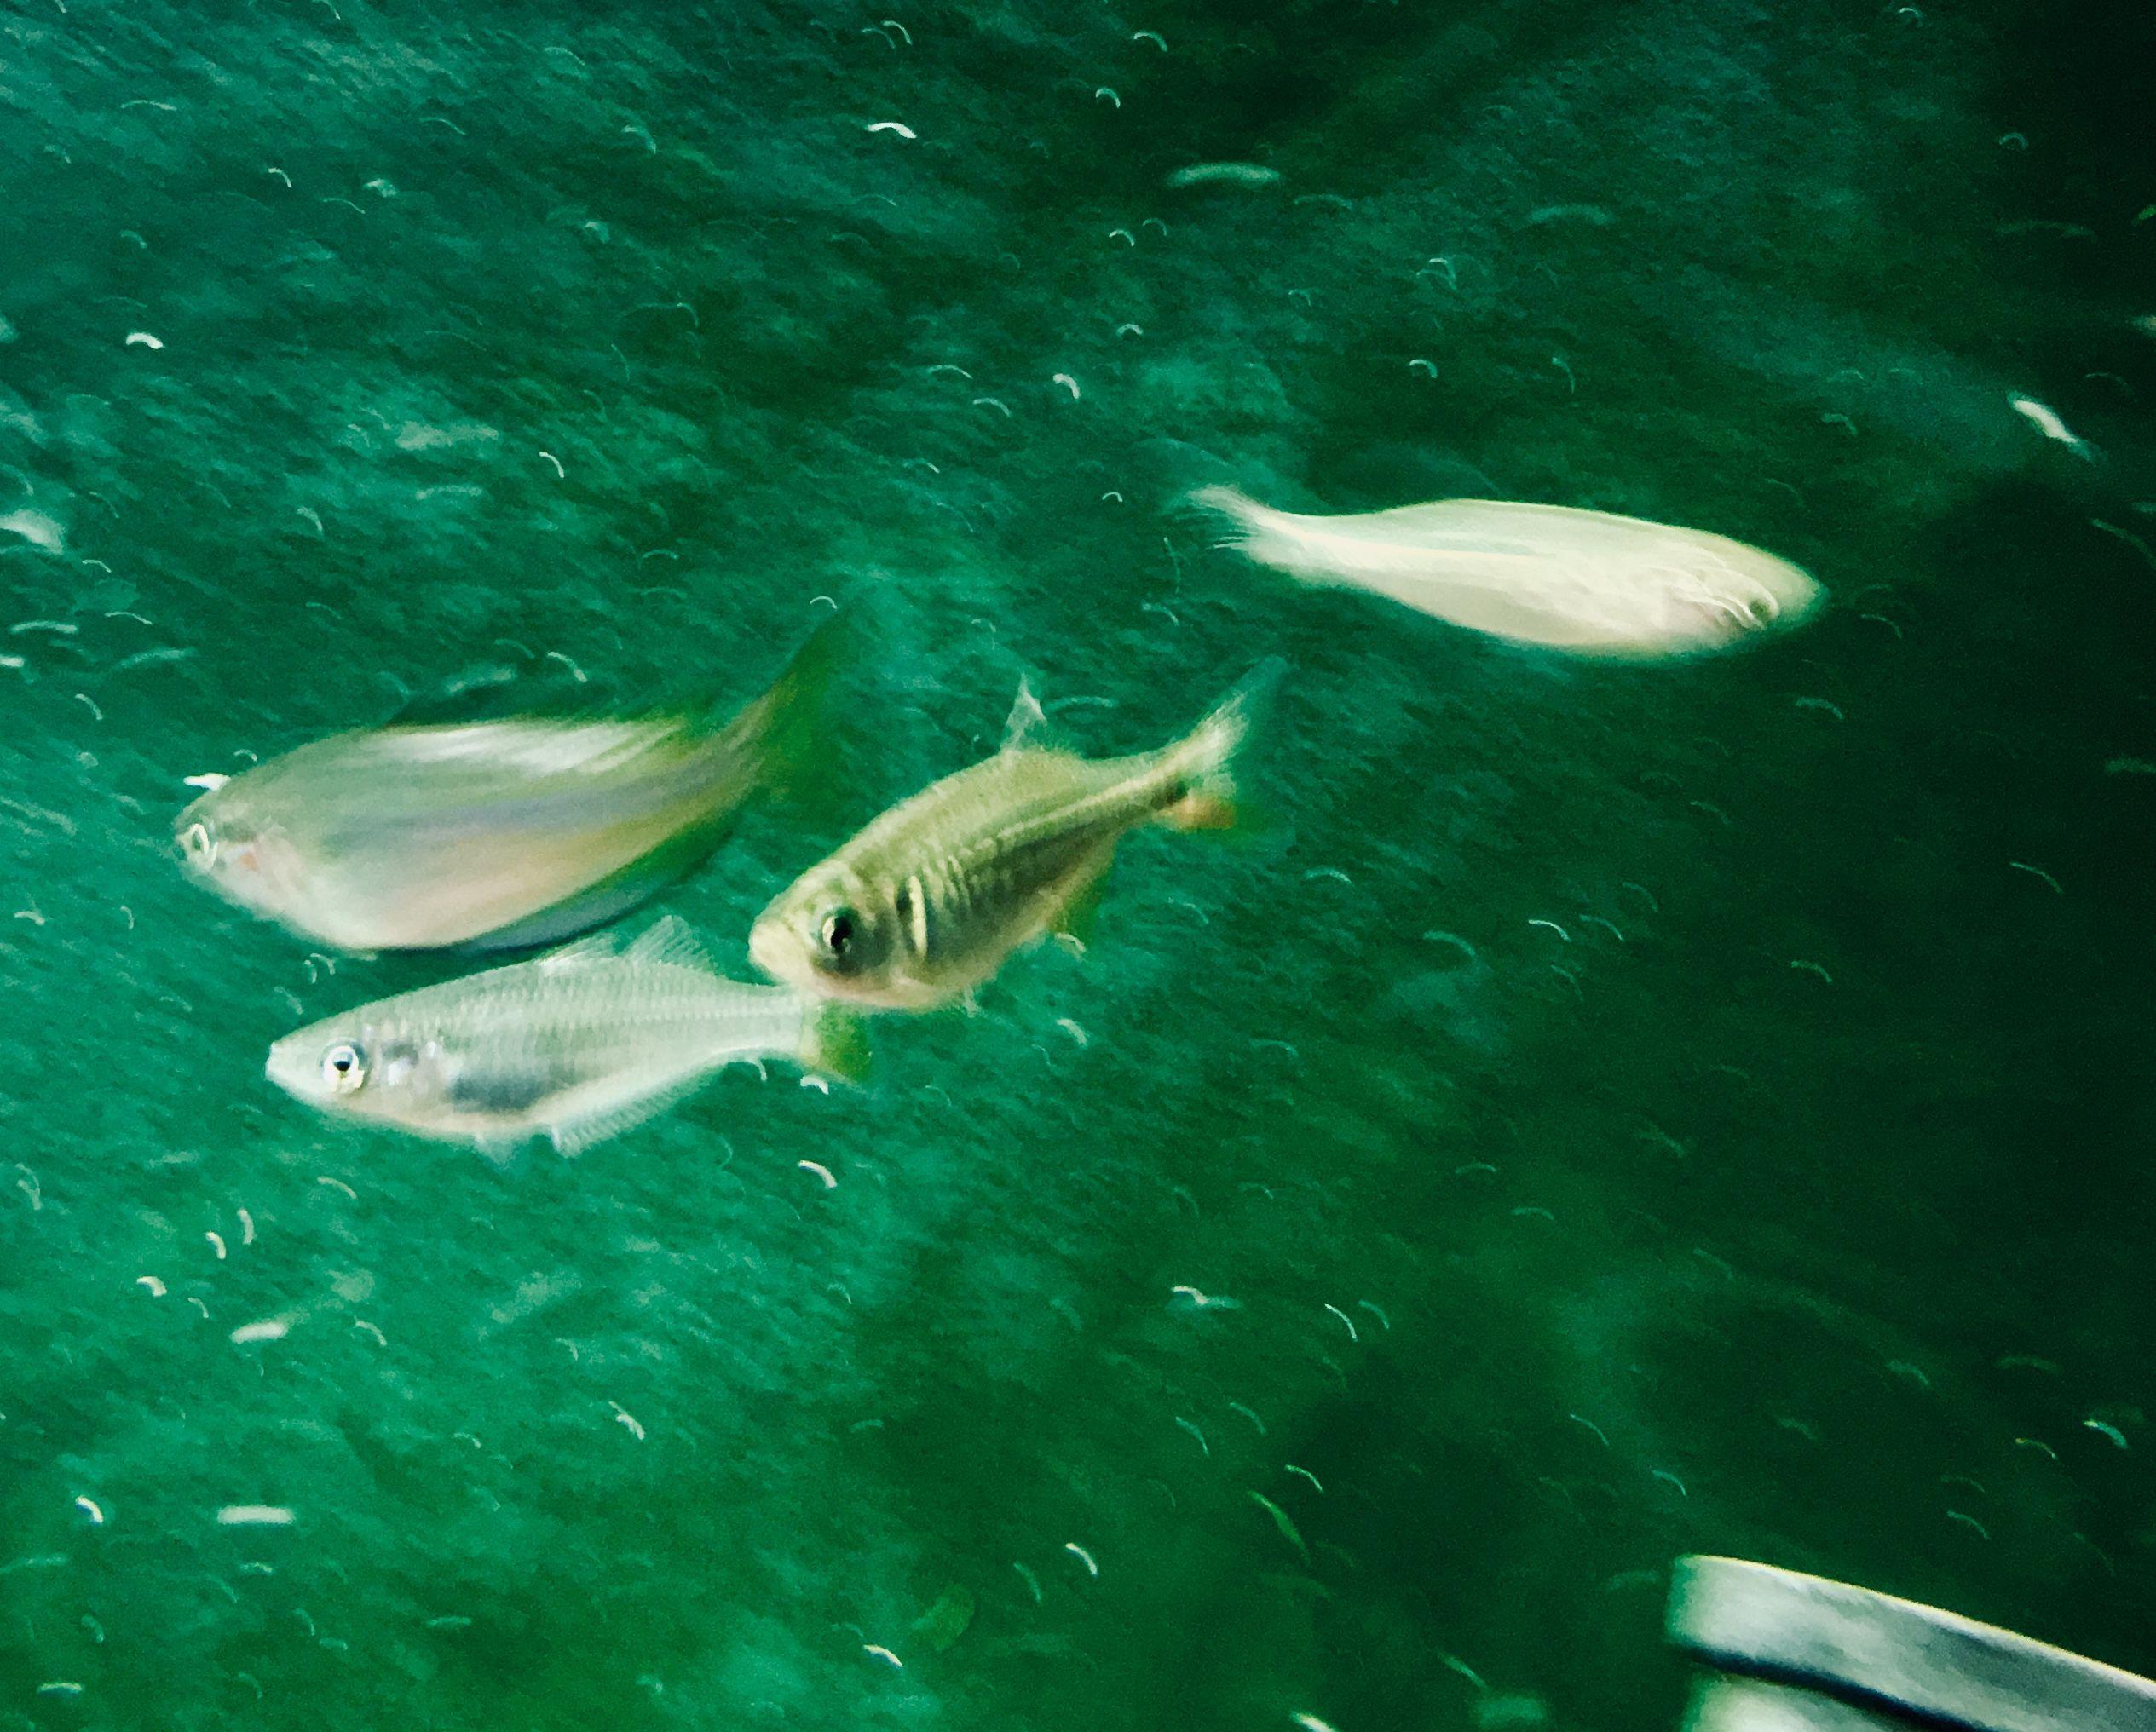 Giant Danios and Australian Rainbowfish Dither fish